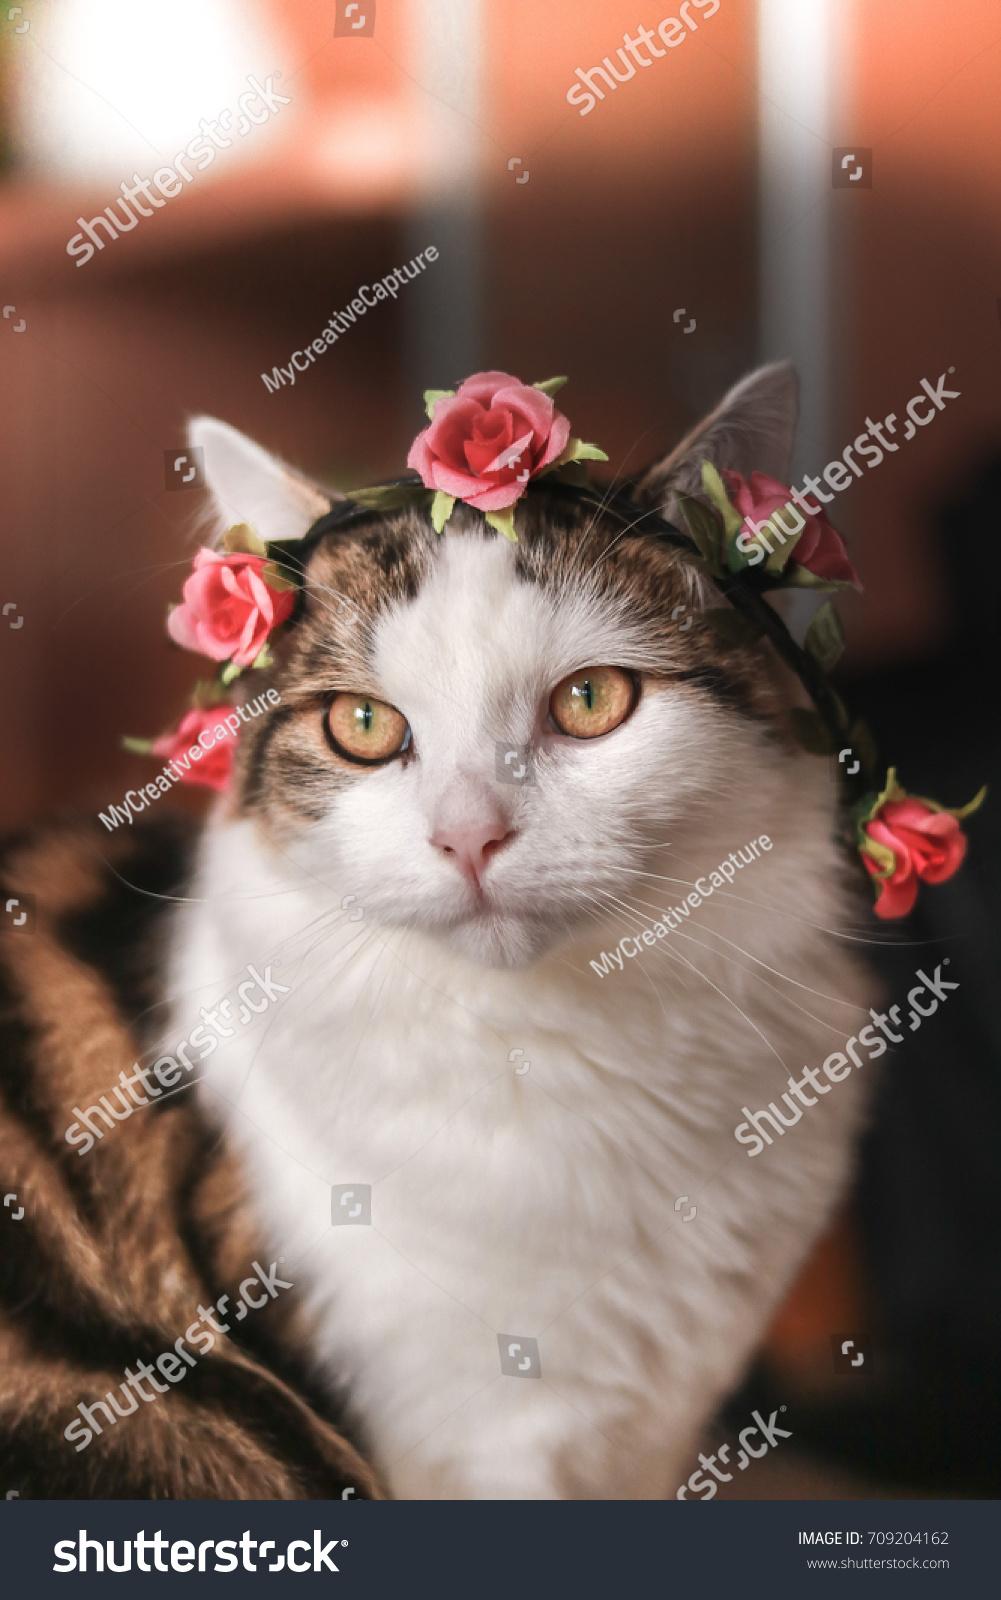 Beautiful Cat Wearing Flower Crown Stock Photo Edit Now 709204162